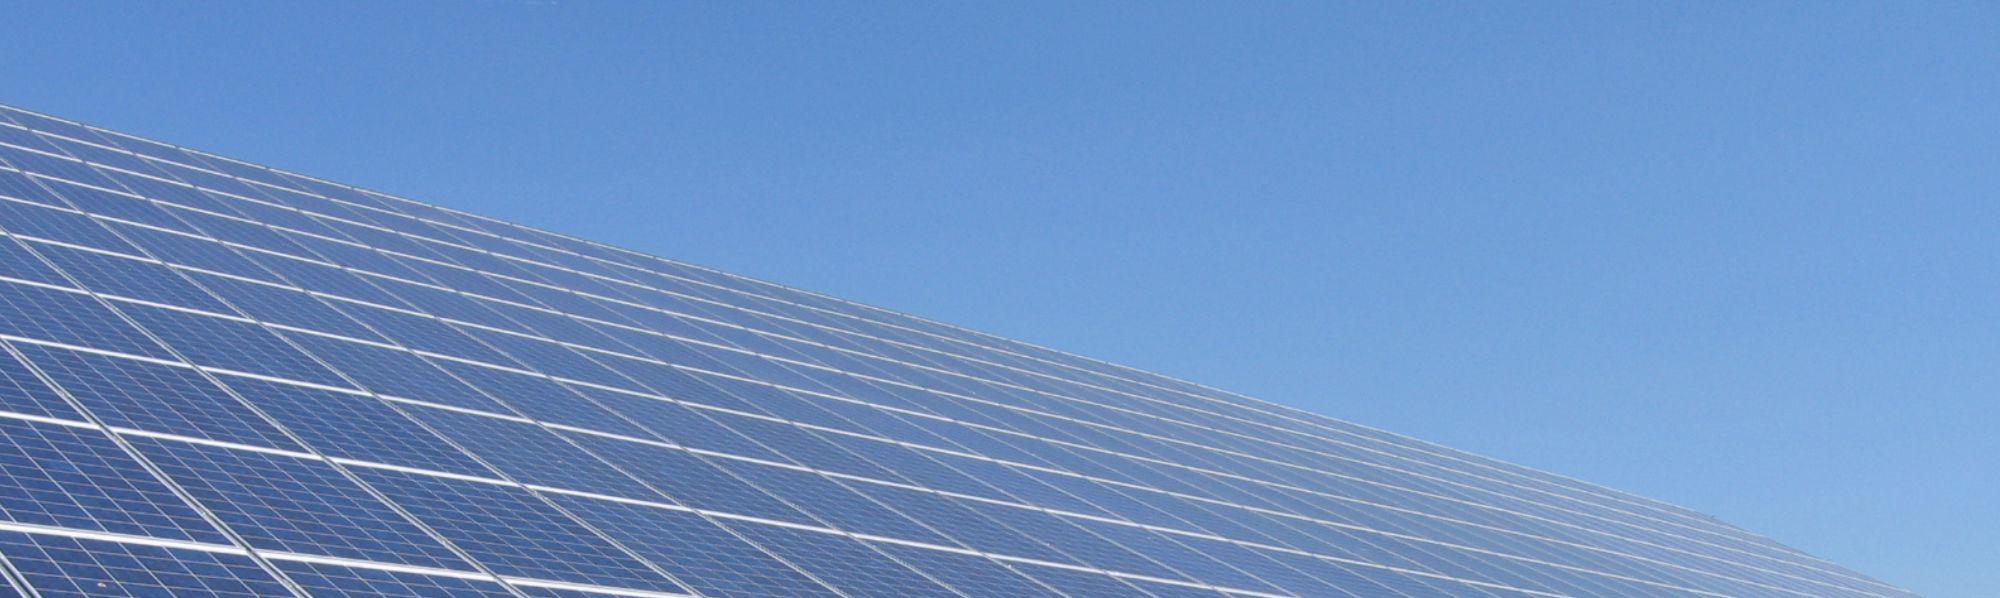 sb energy photovoltaique devis installation agricole